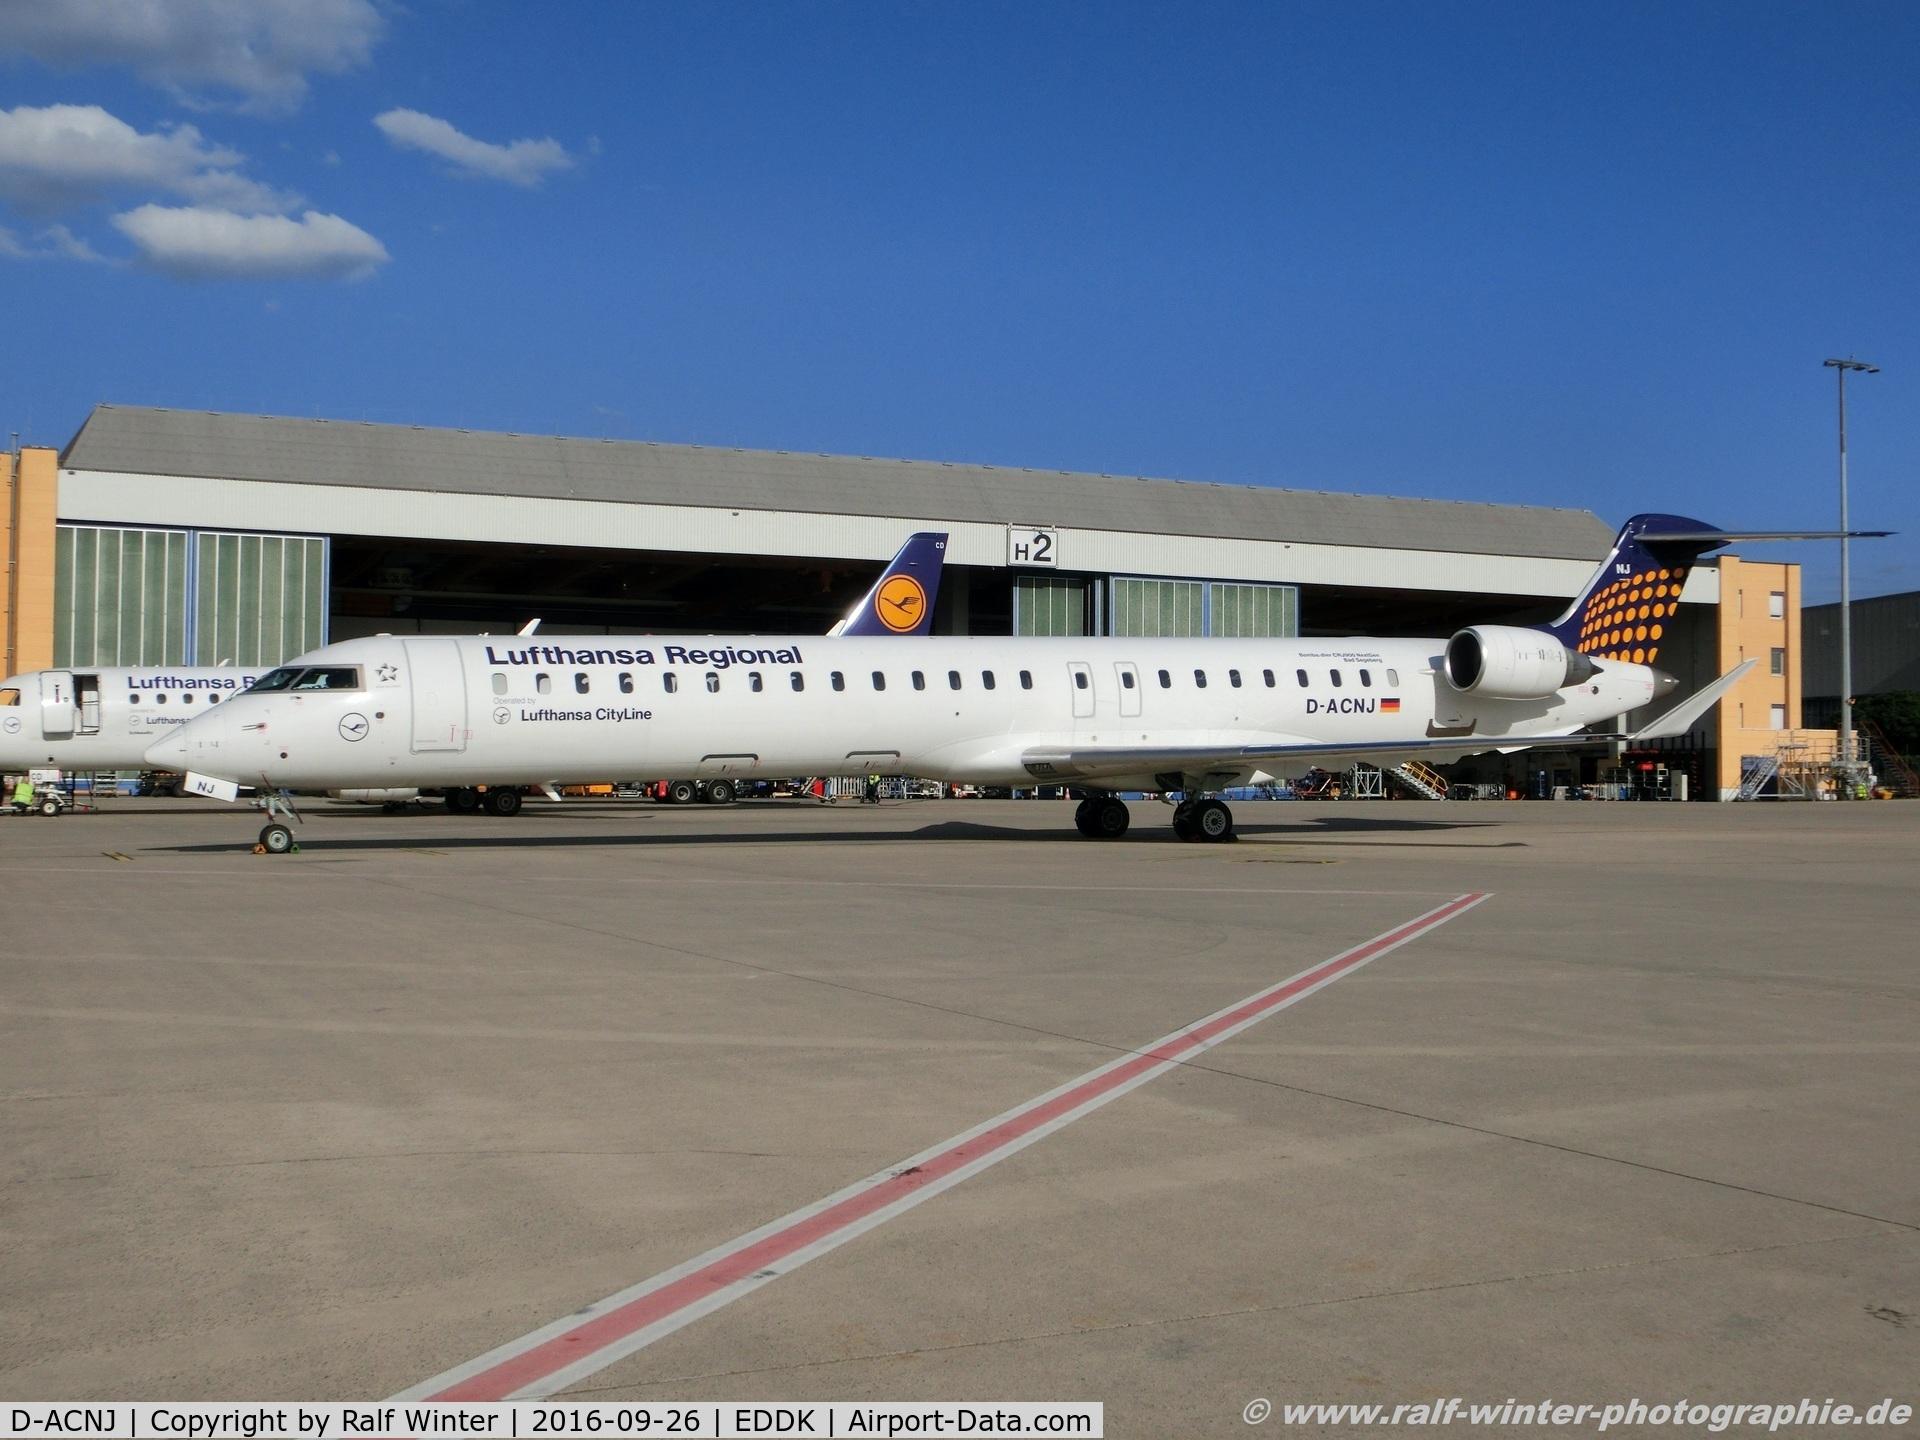 D-ACNJ, 2010 Bombardier CRJ-900 NG (CL-600-2D24) C/N 15249, Bombardier CL-600-2D24 CRJ-900LR - EW EWG - Eurowings  'Lufthansa Regional' - 15249 - D-ACNJ - 26.09.2016 - CGN